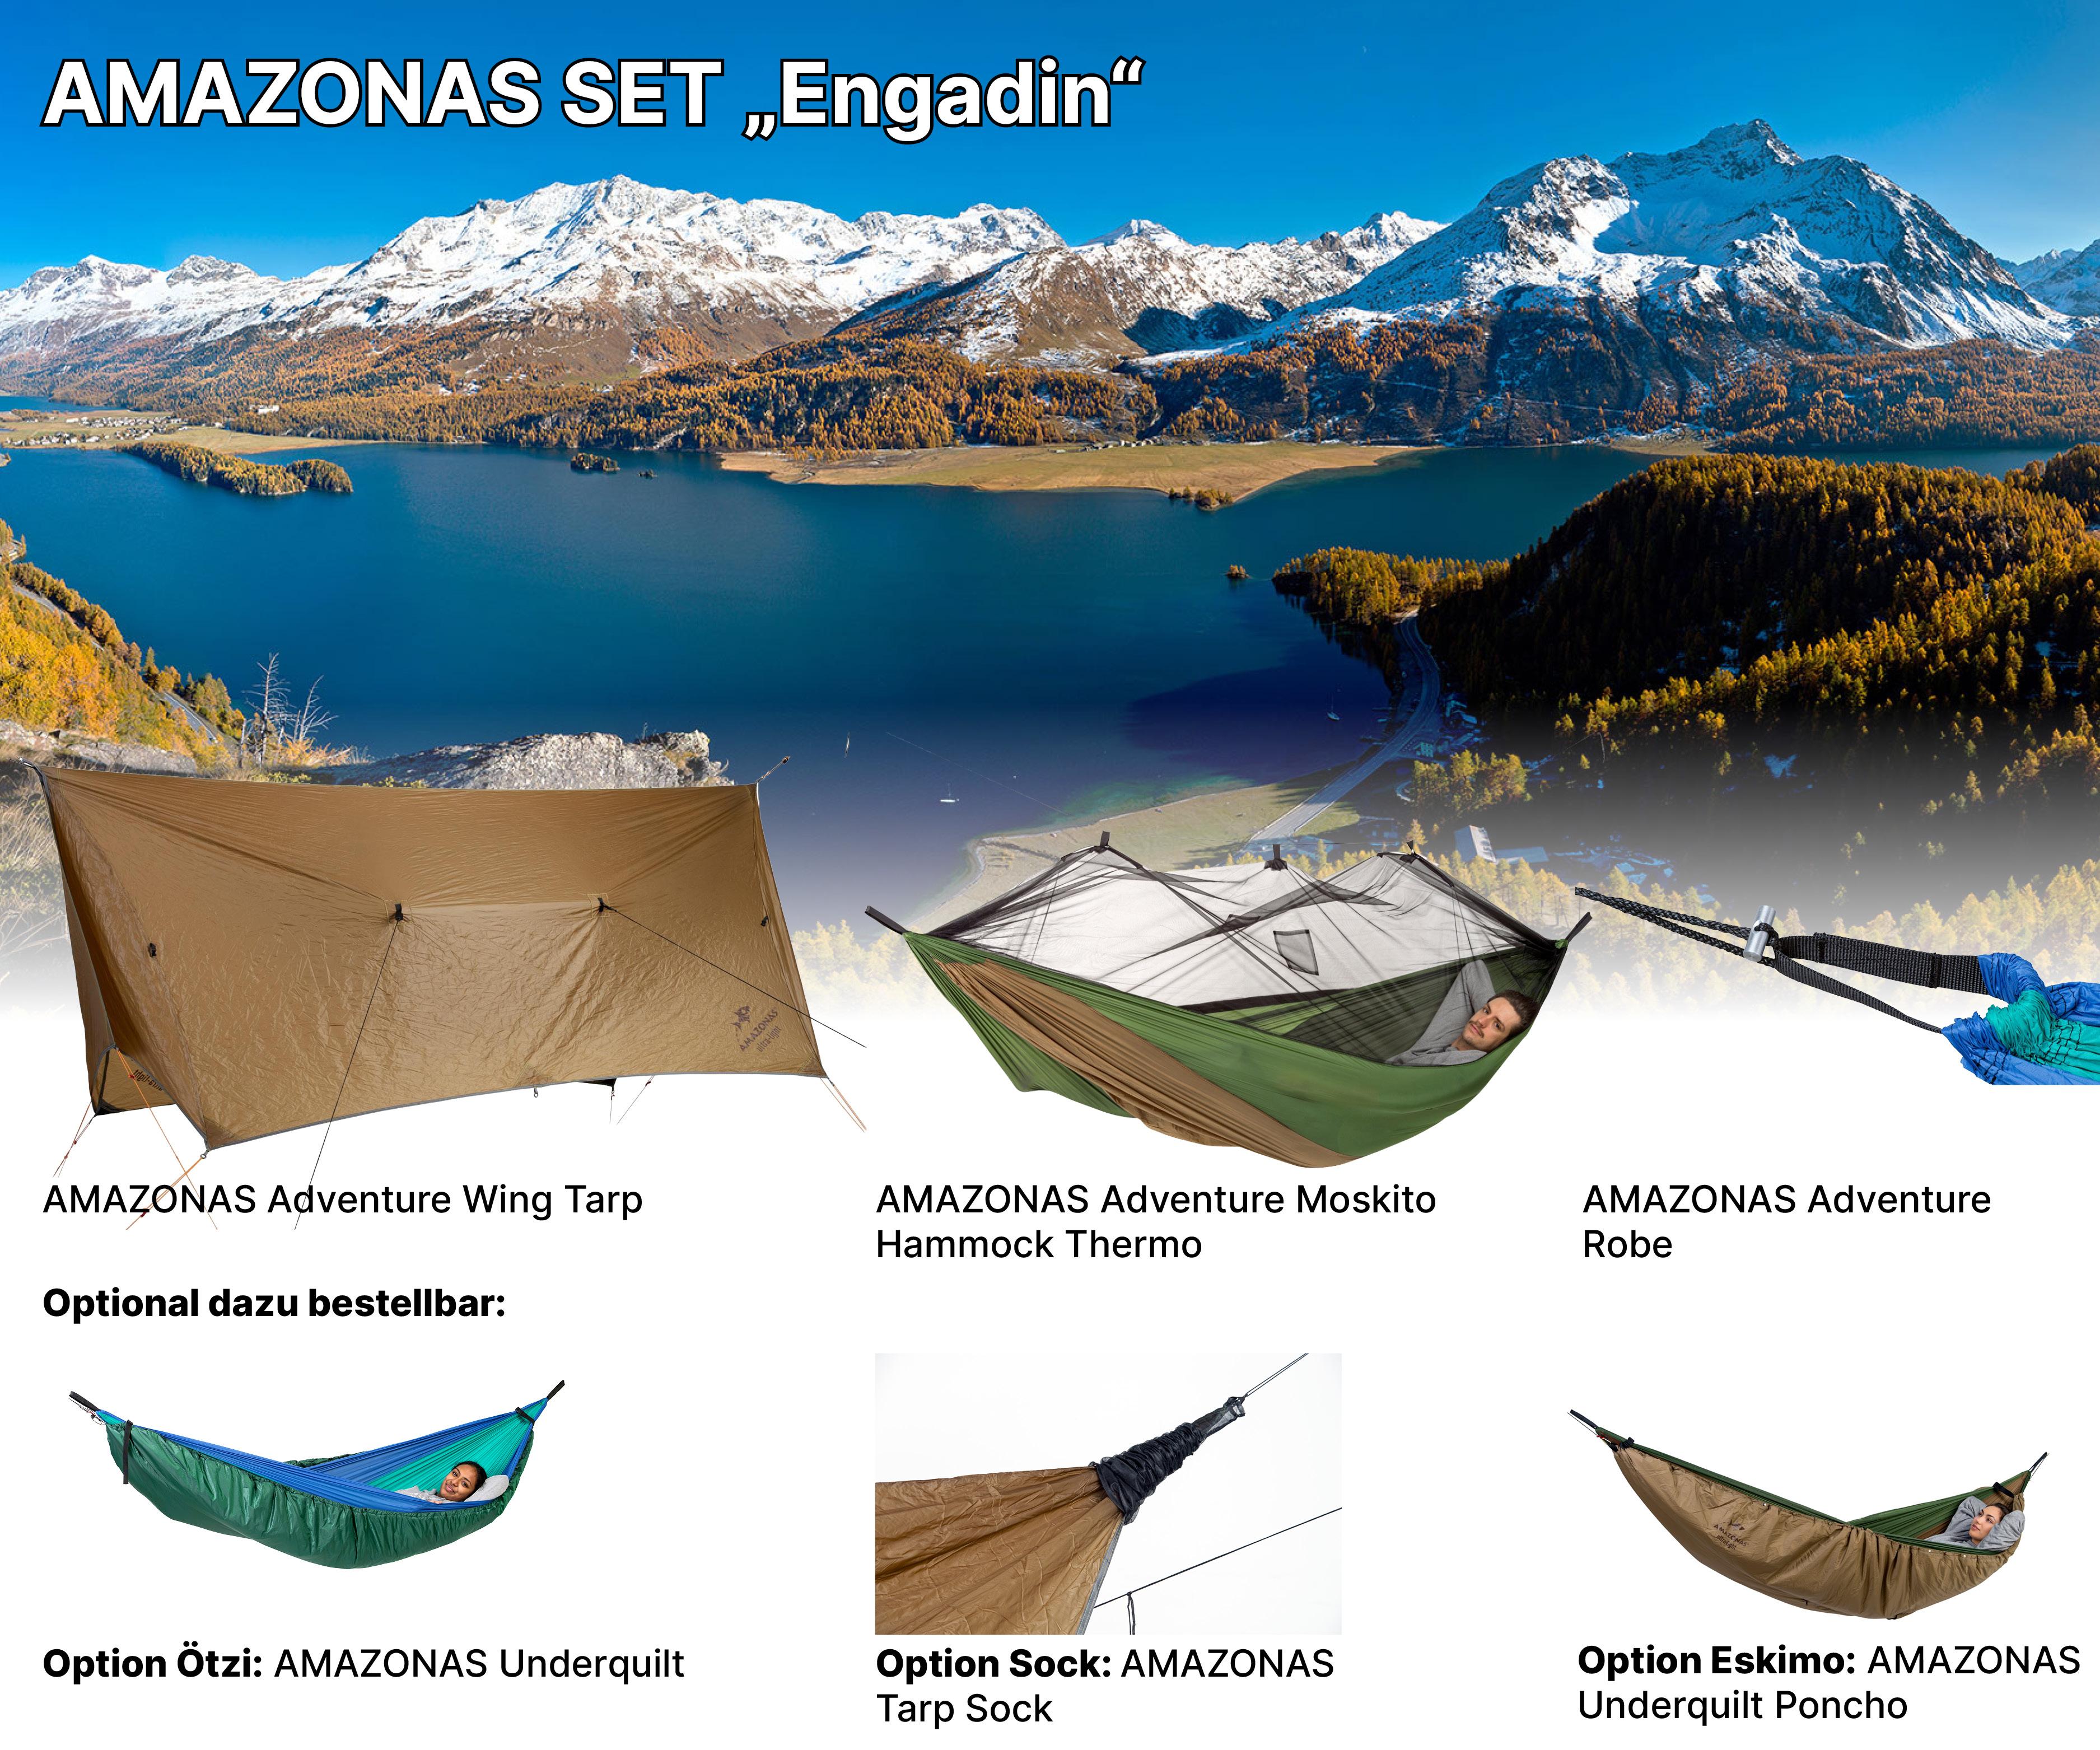 AMAZONAS Adventure Set Engadin